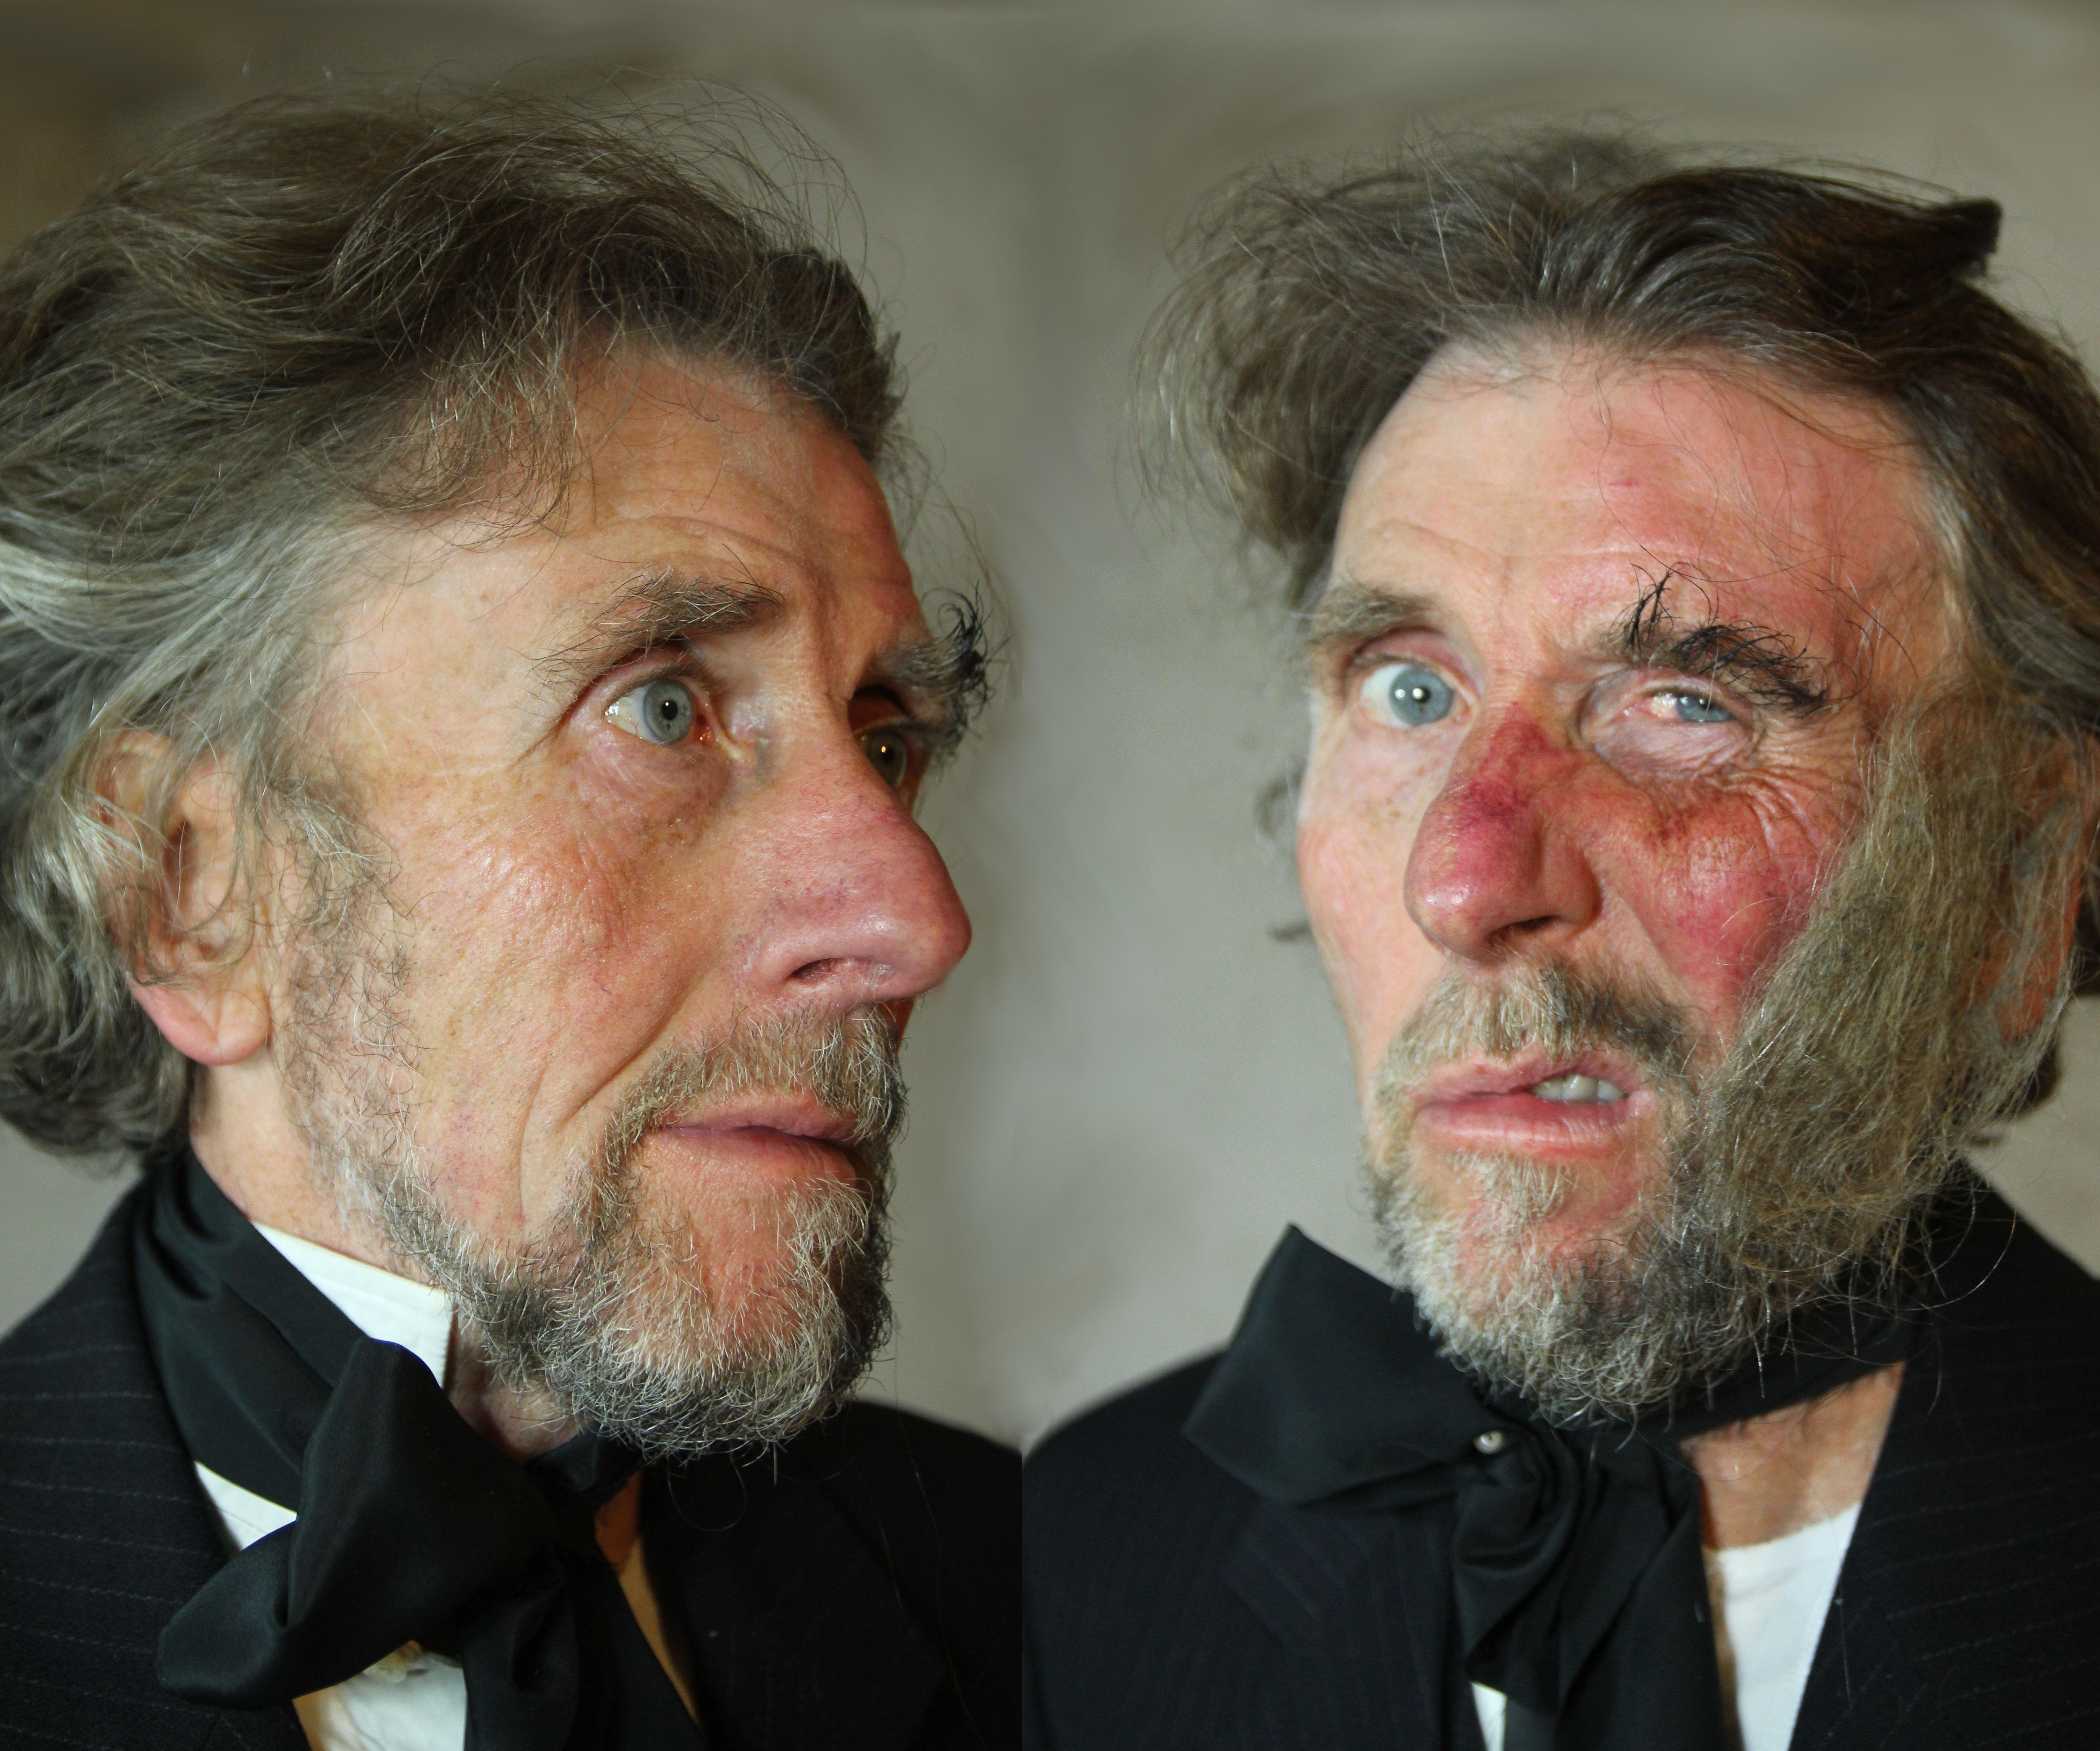 DR JEKYLL & MR HYDE COSTUME